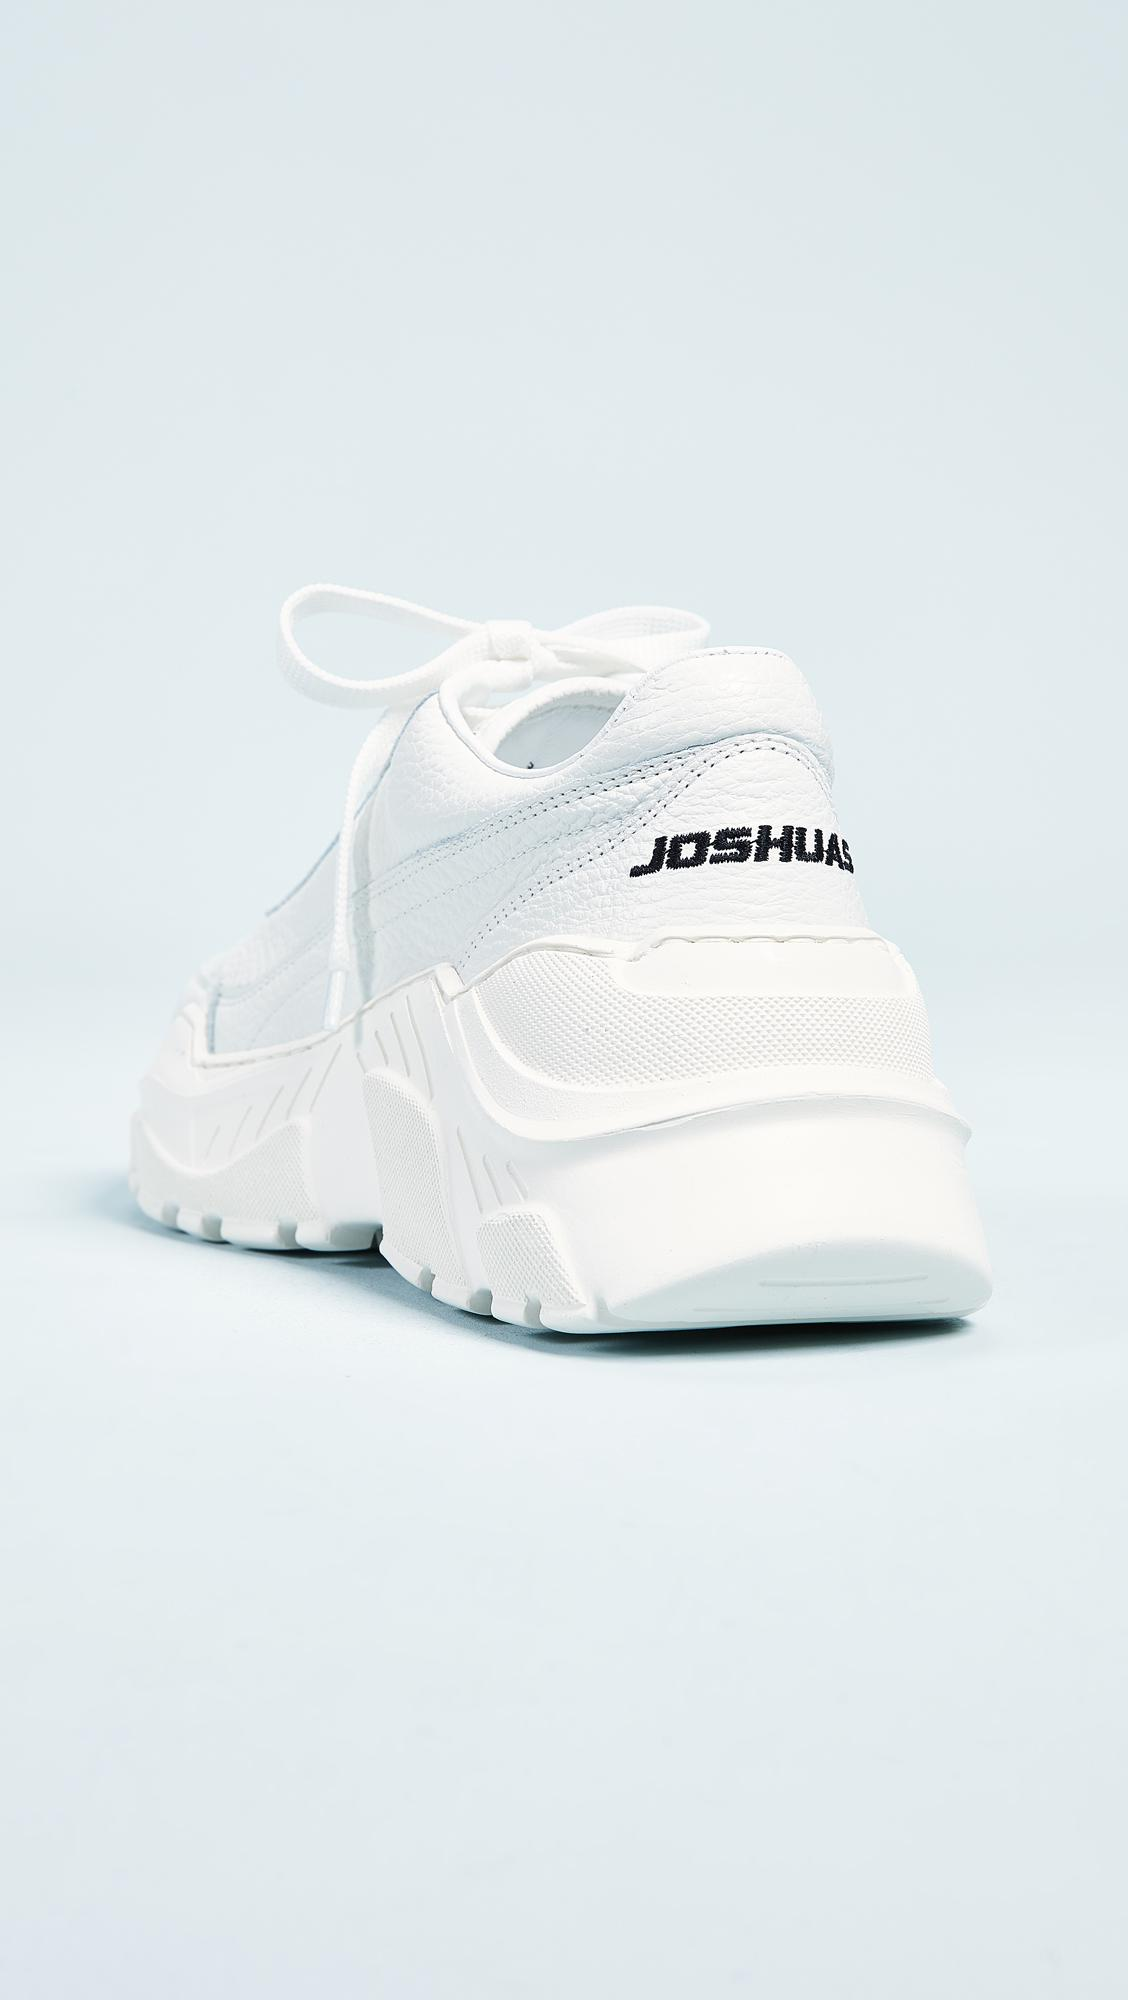 JOSHUA SANDERS Women's Zenith Leather Lace Up Platform Sneakers gVWNEcq8